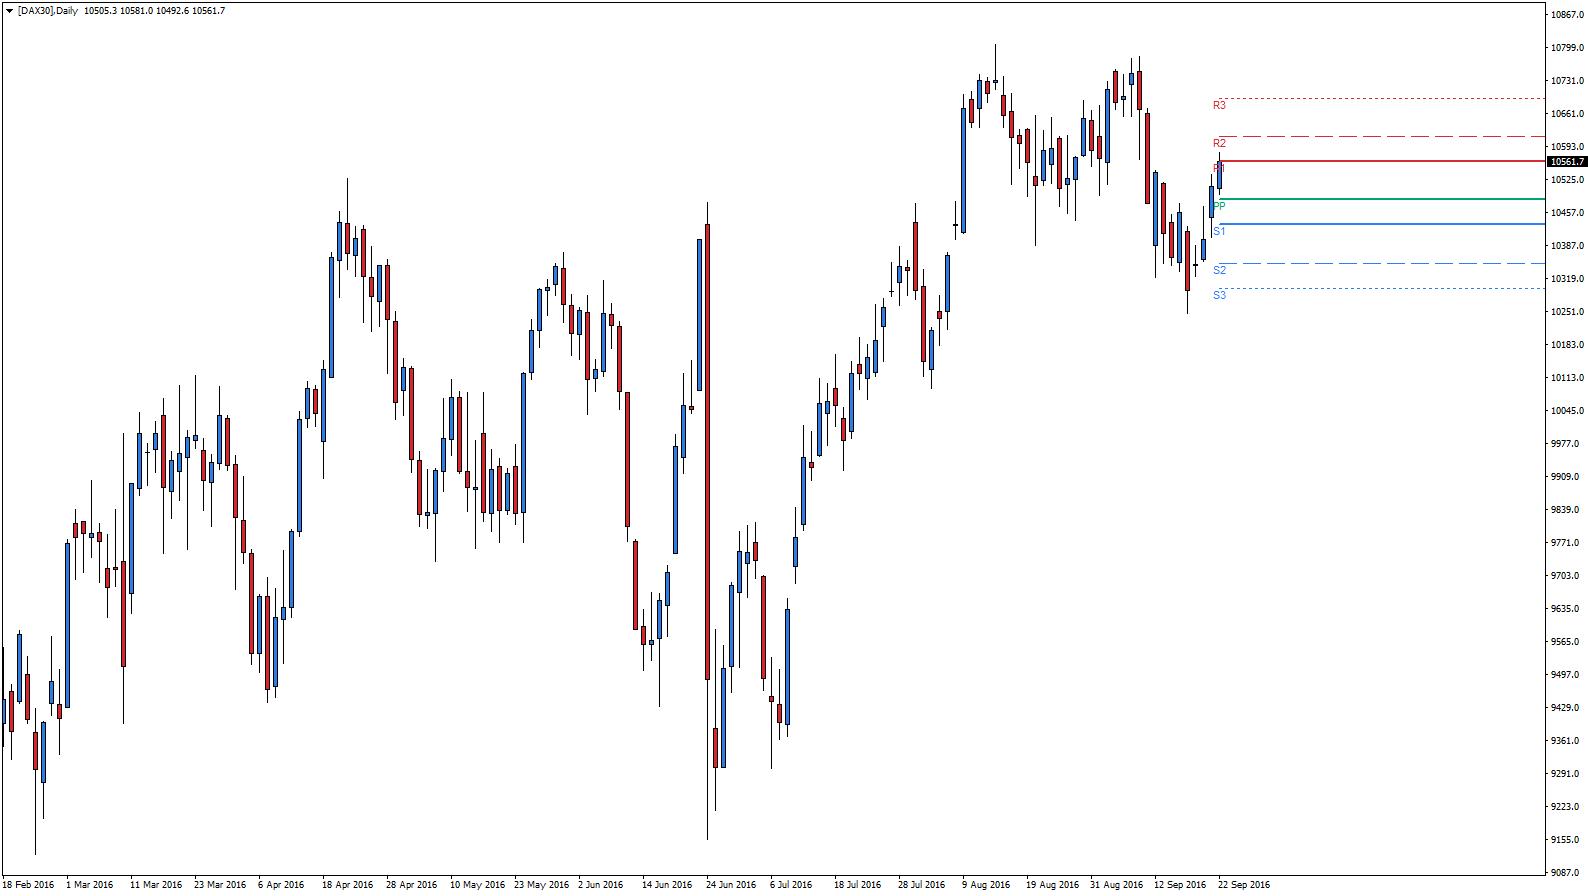 dax30-d1-admiral-markets-as